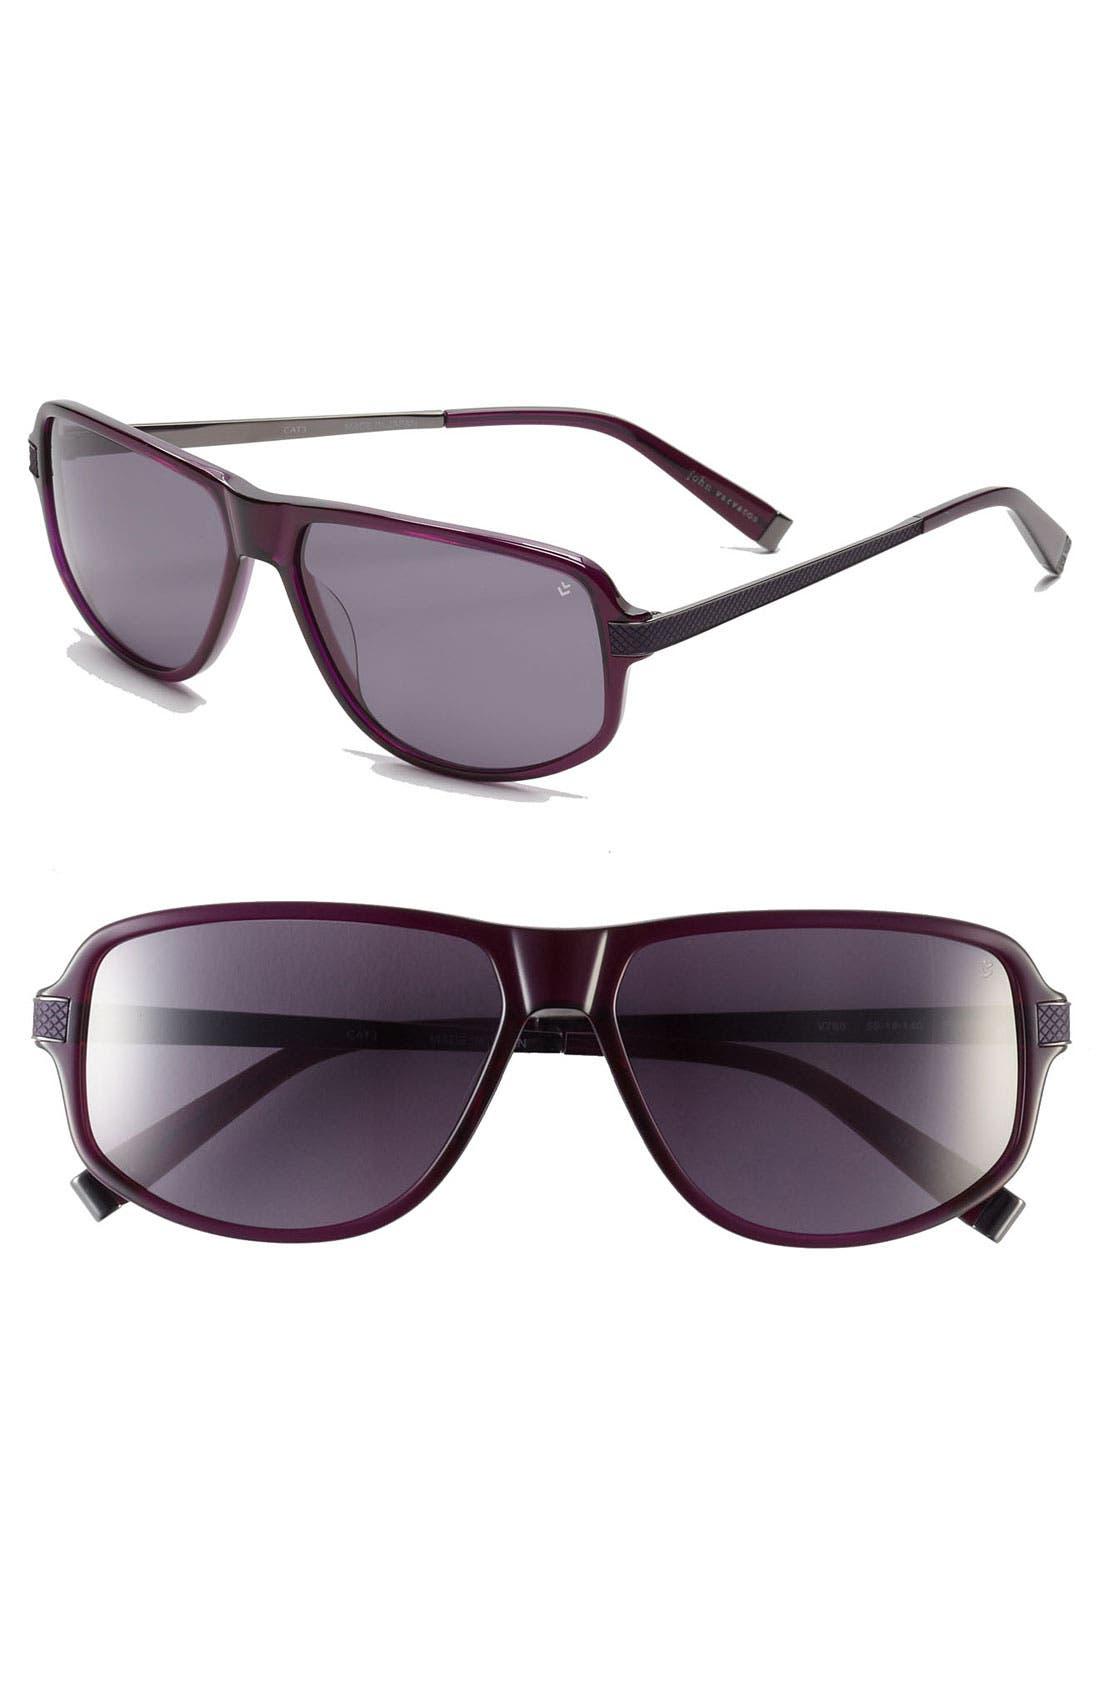 Main Image - John Varvatos Collection 'V780' 59mm Sunglasses